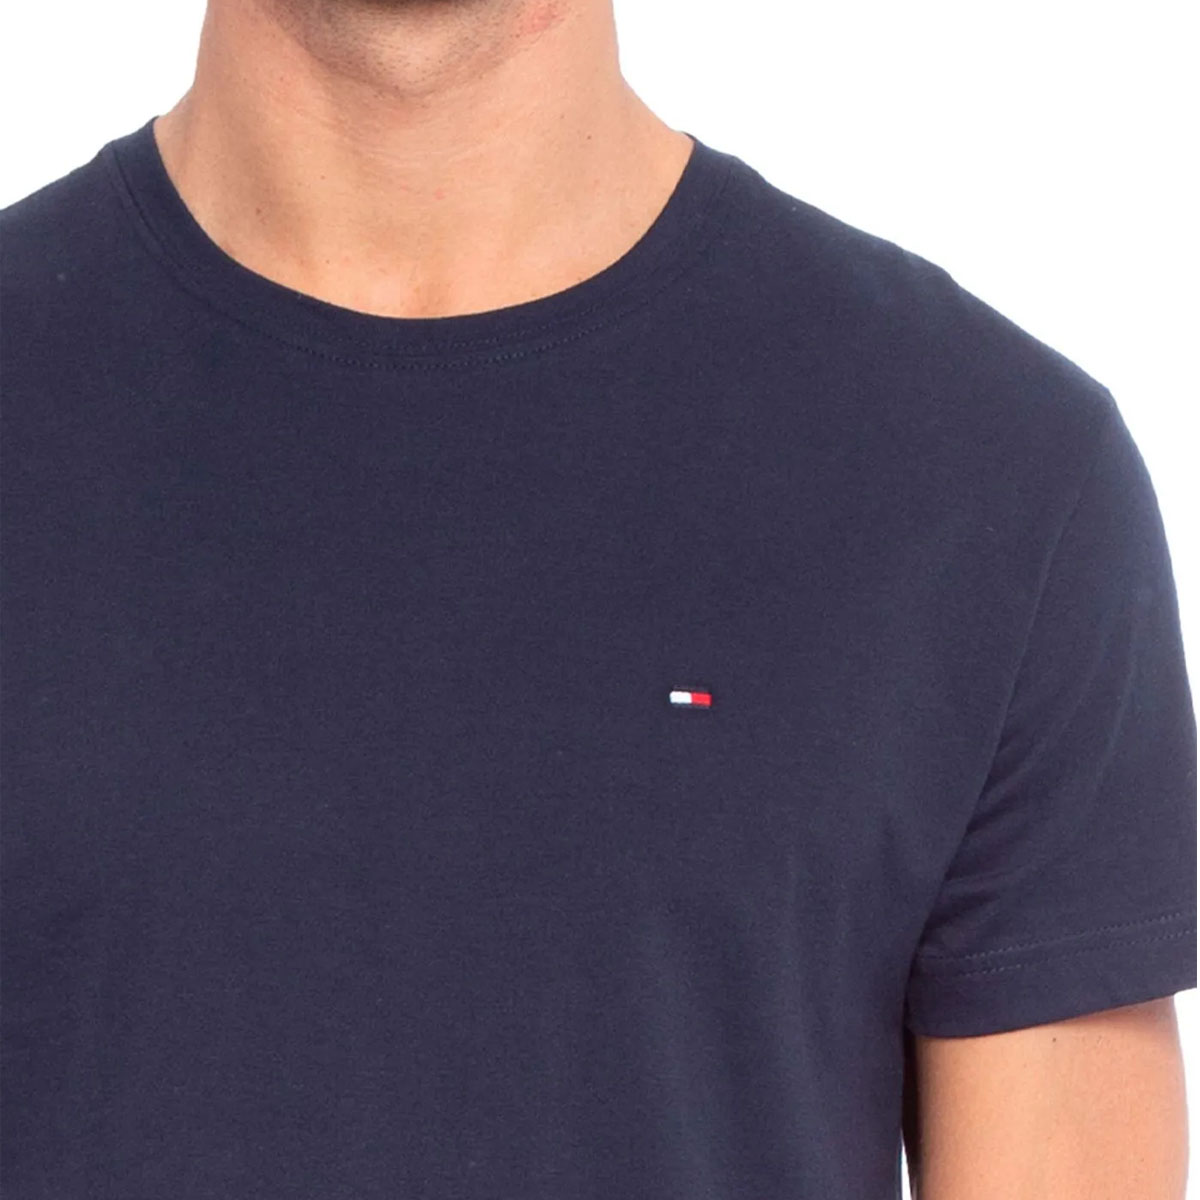 Camiseta Tommy Hifliger Masculina Gola Redonda Azul Marinho